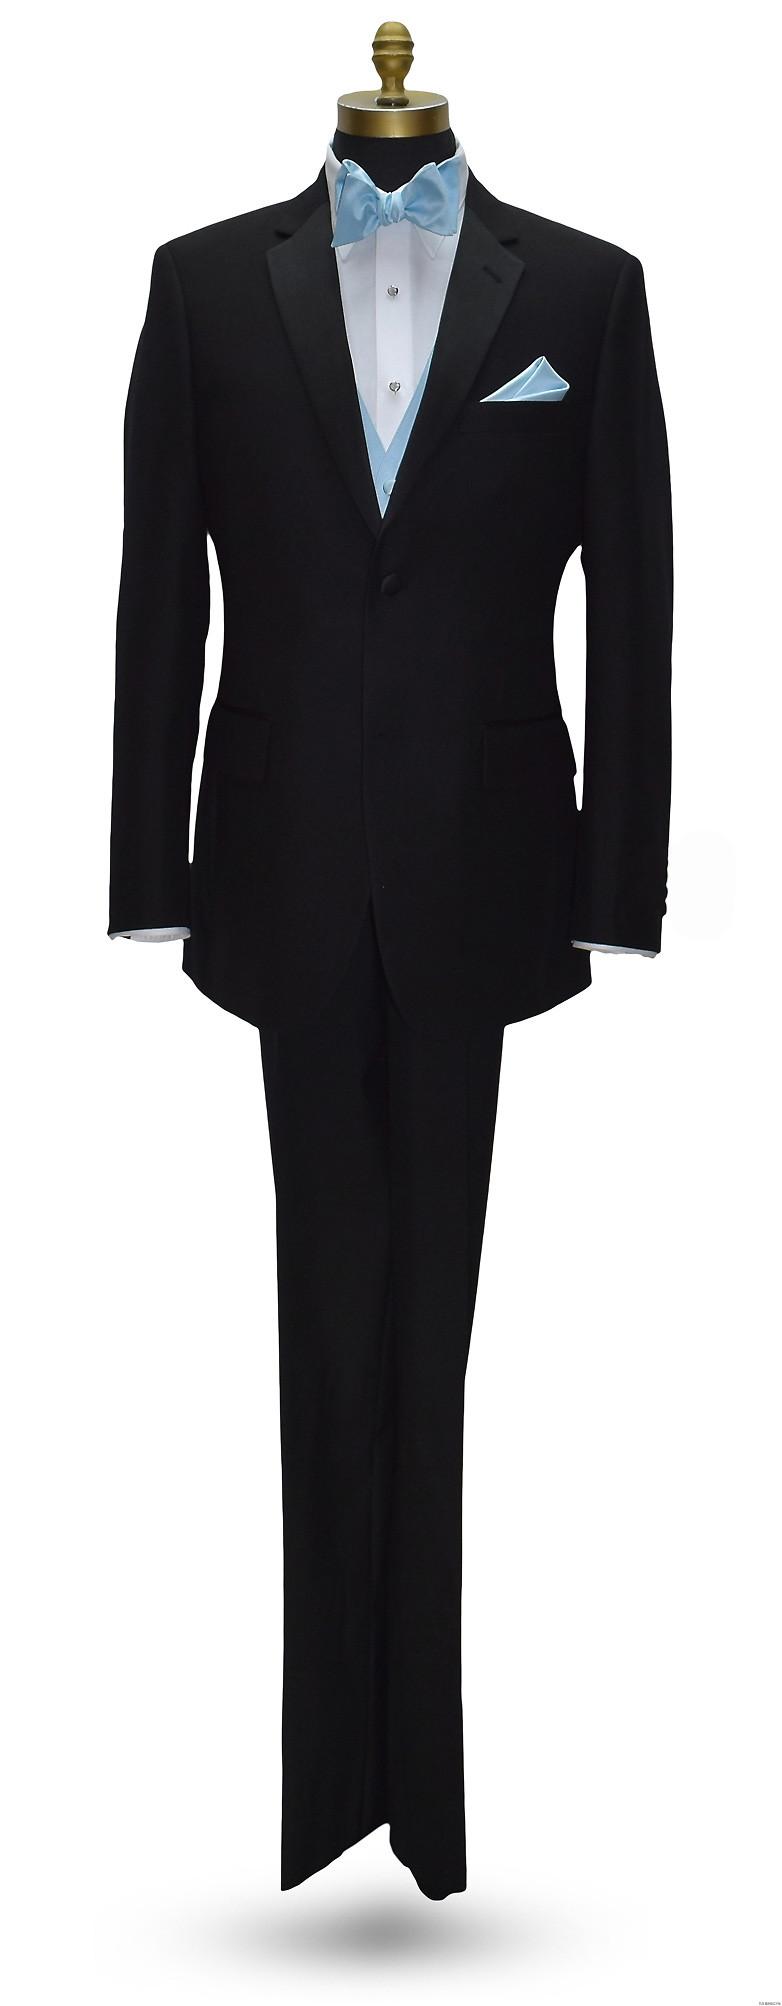 black San Miguel notch lapel tuxedo with capri-blue self-tie bowtie and capri-blue vest and pocket handkerchief